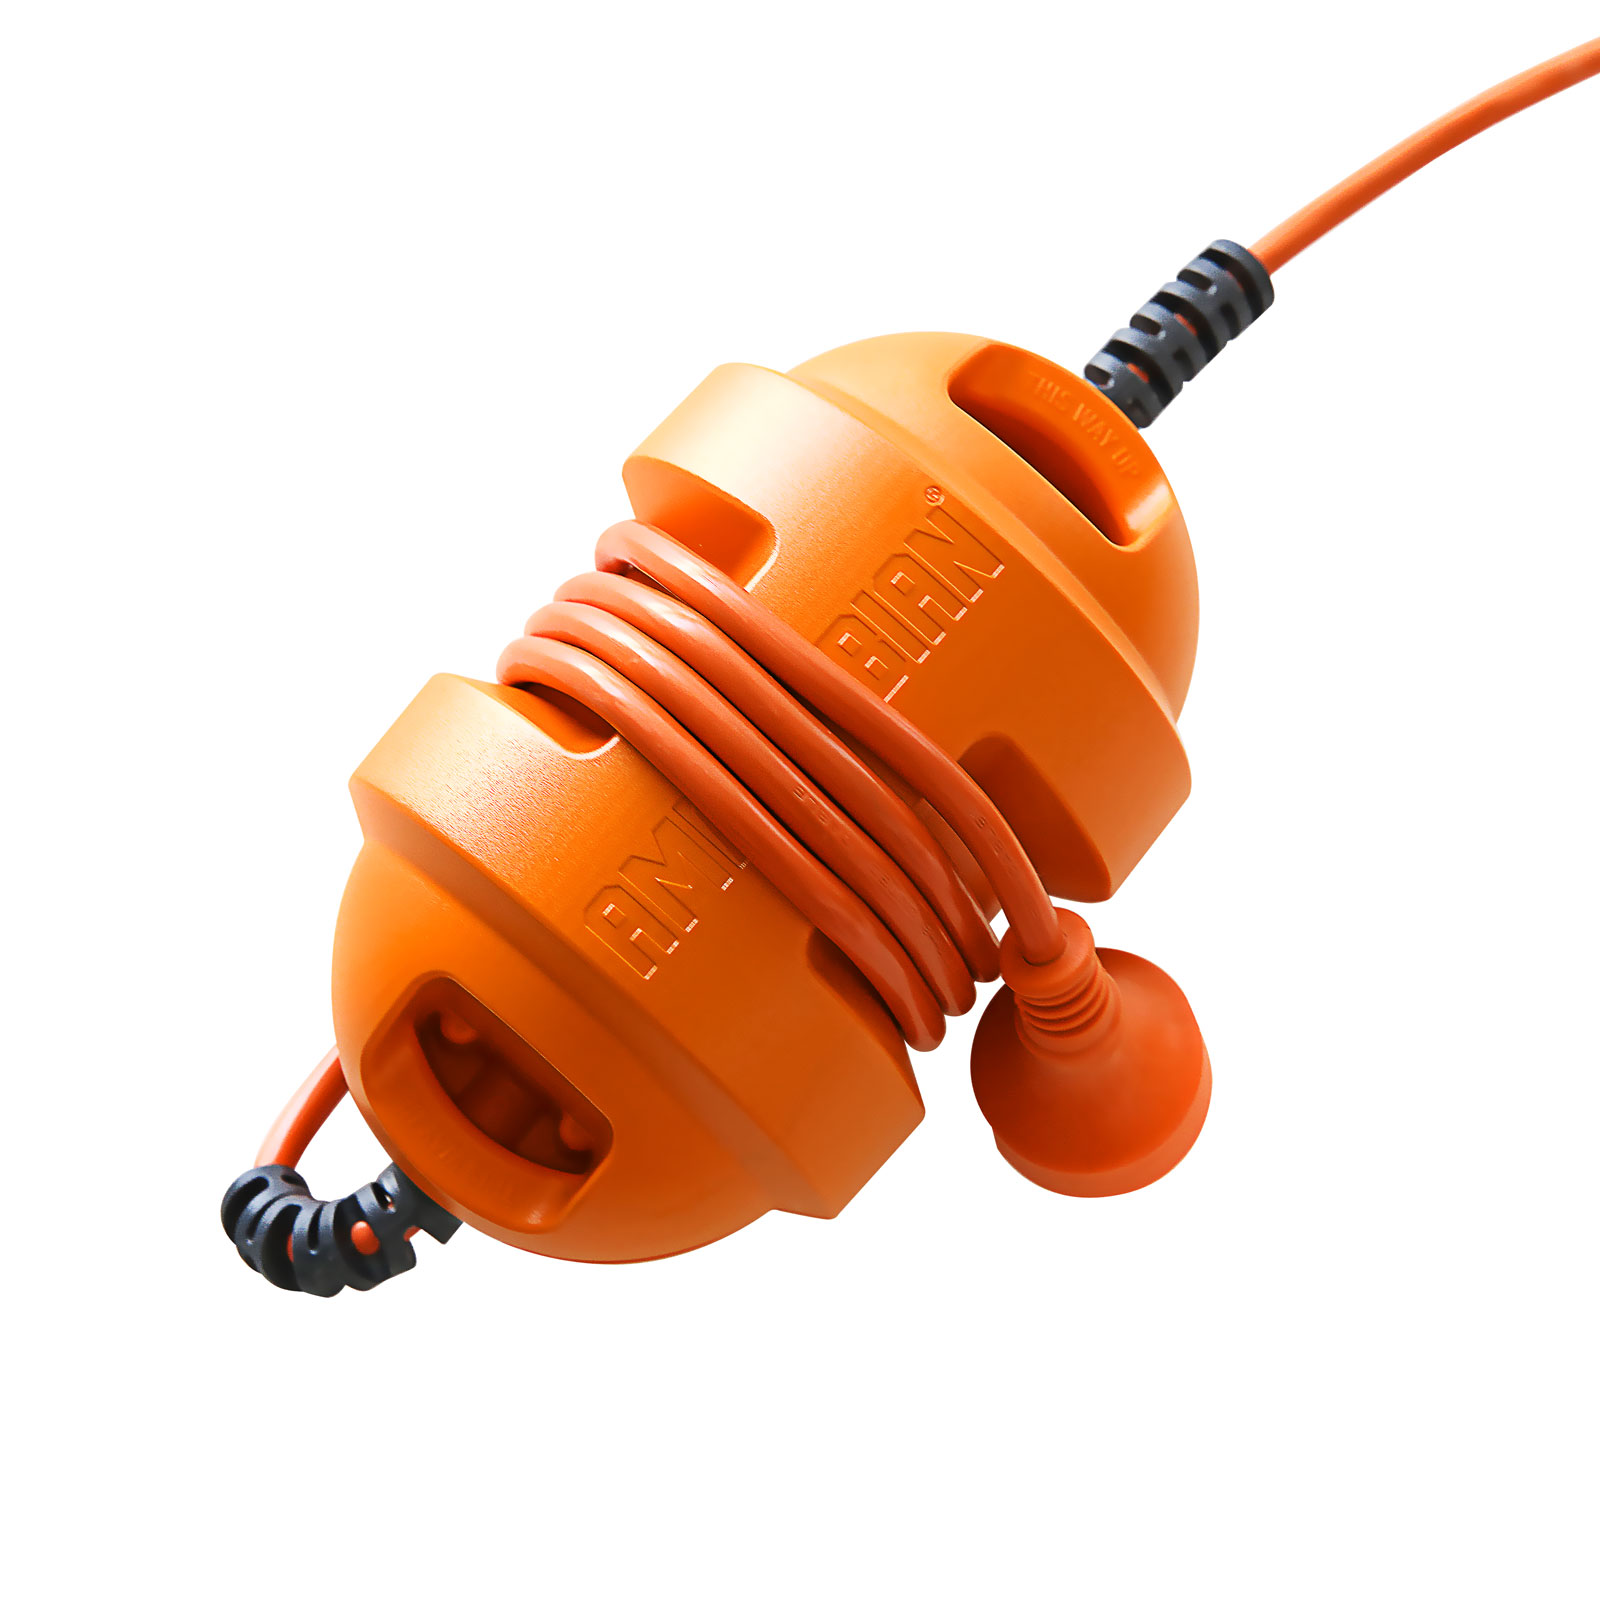 Caravan-Power-Adaptor-orange-mini-15A